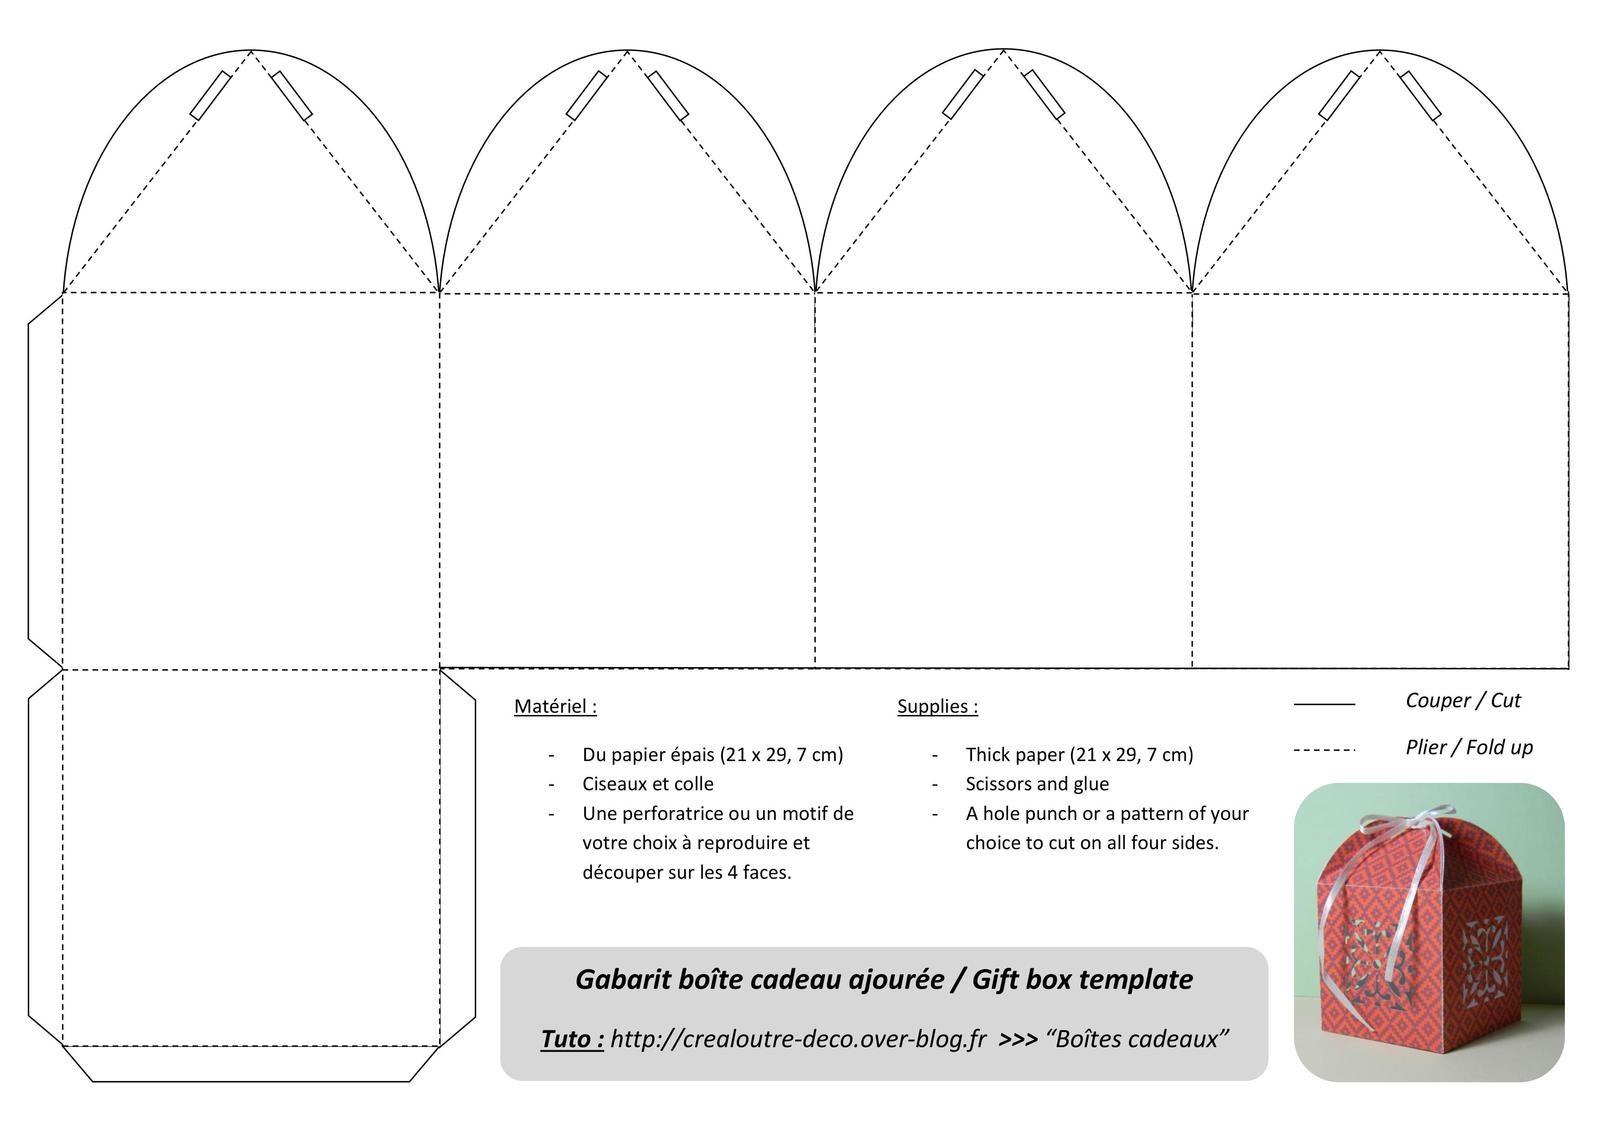 Tuto : Boîte Cadeau Ajourée - Crealoutre concernant Patron Pour Boite En Carton